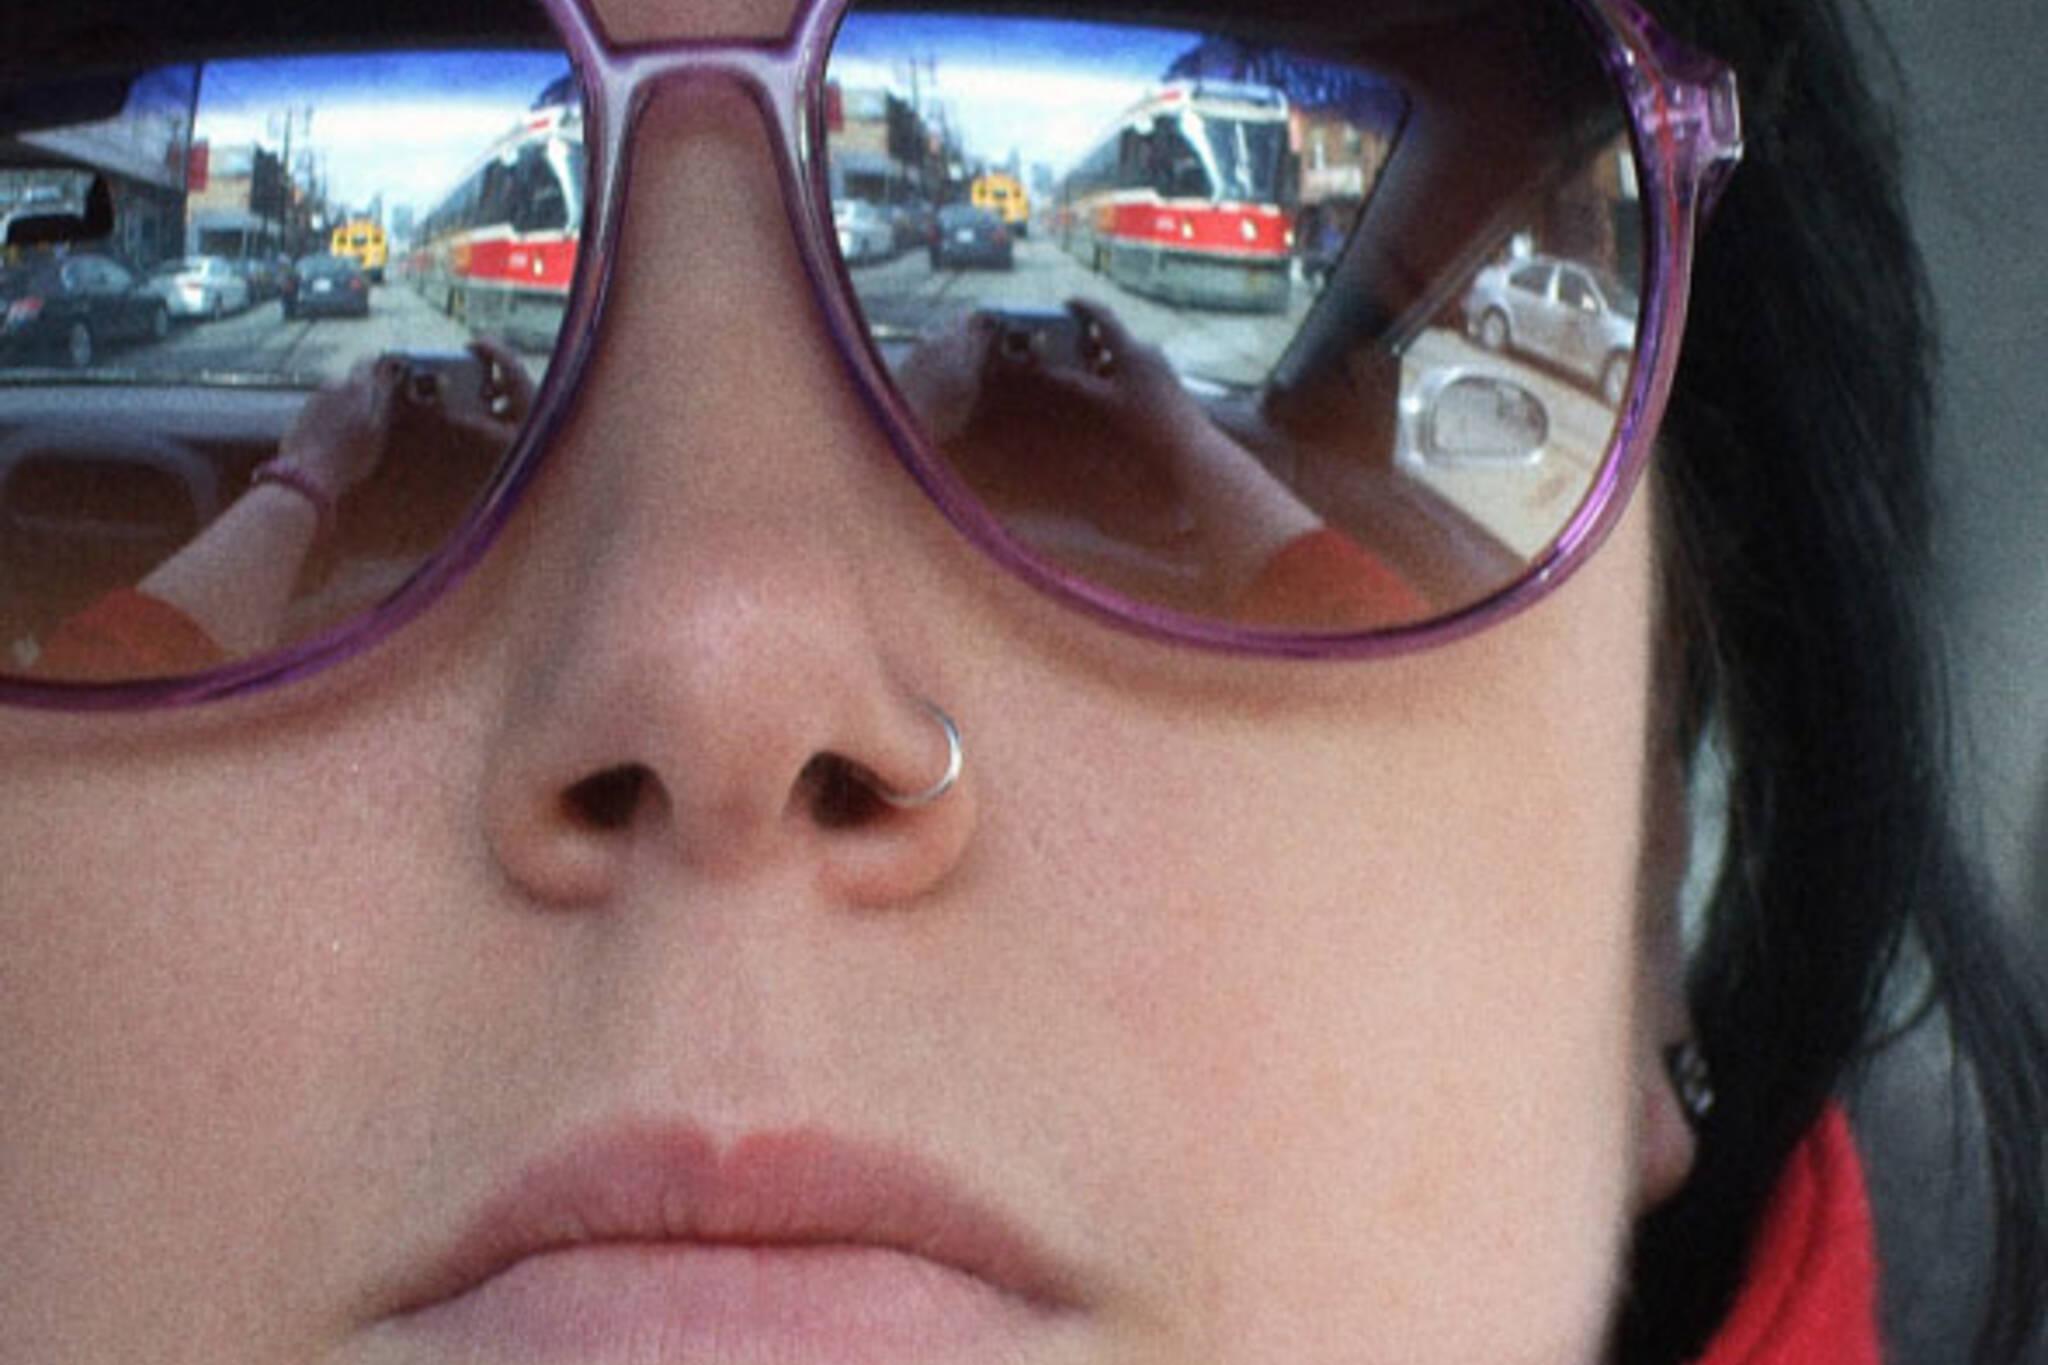 TTC STREETCAR sunglasses reflection